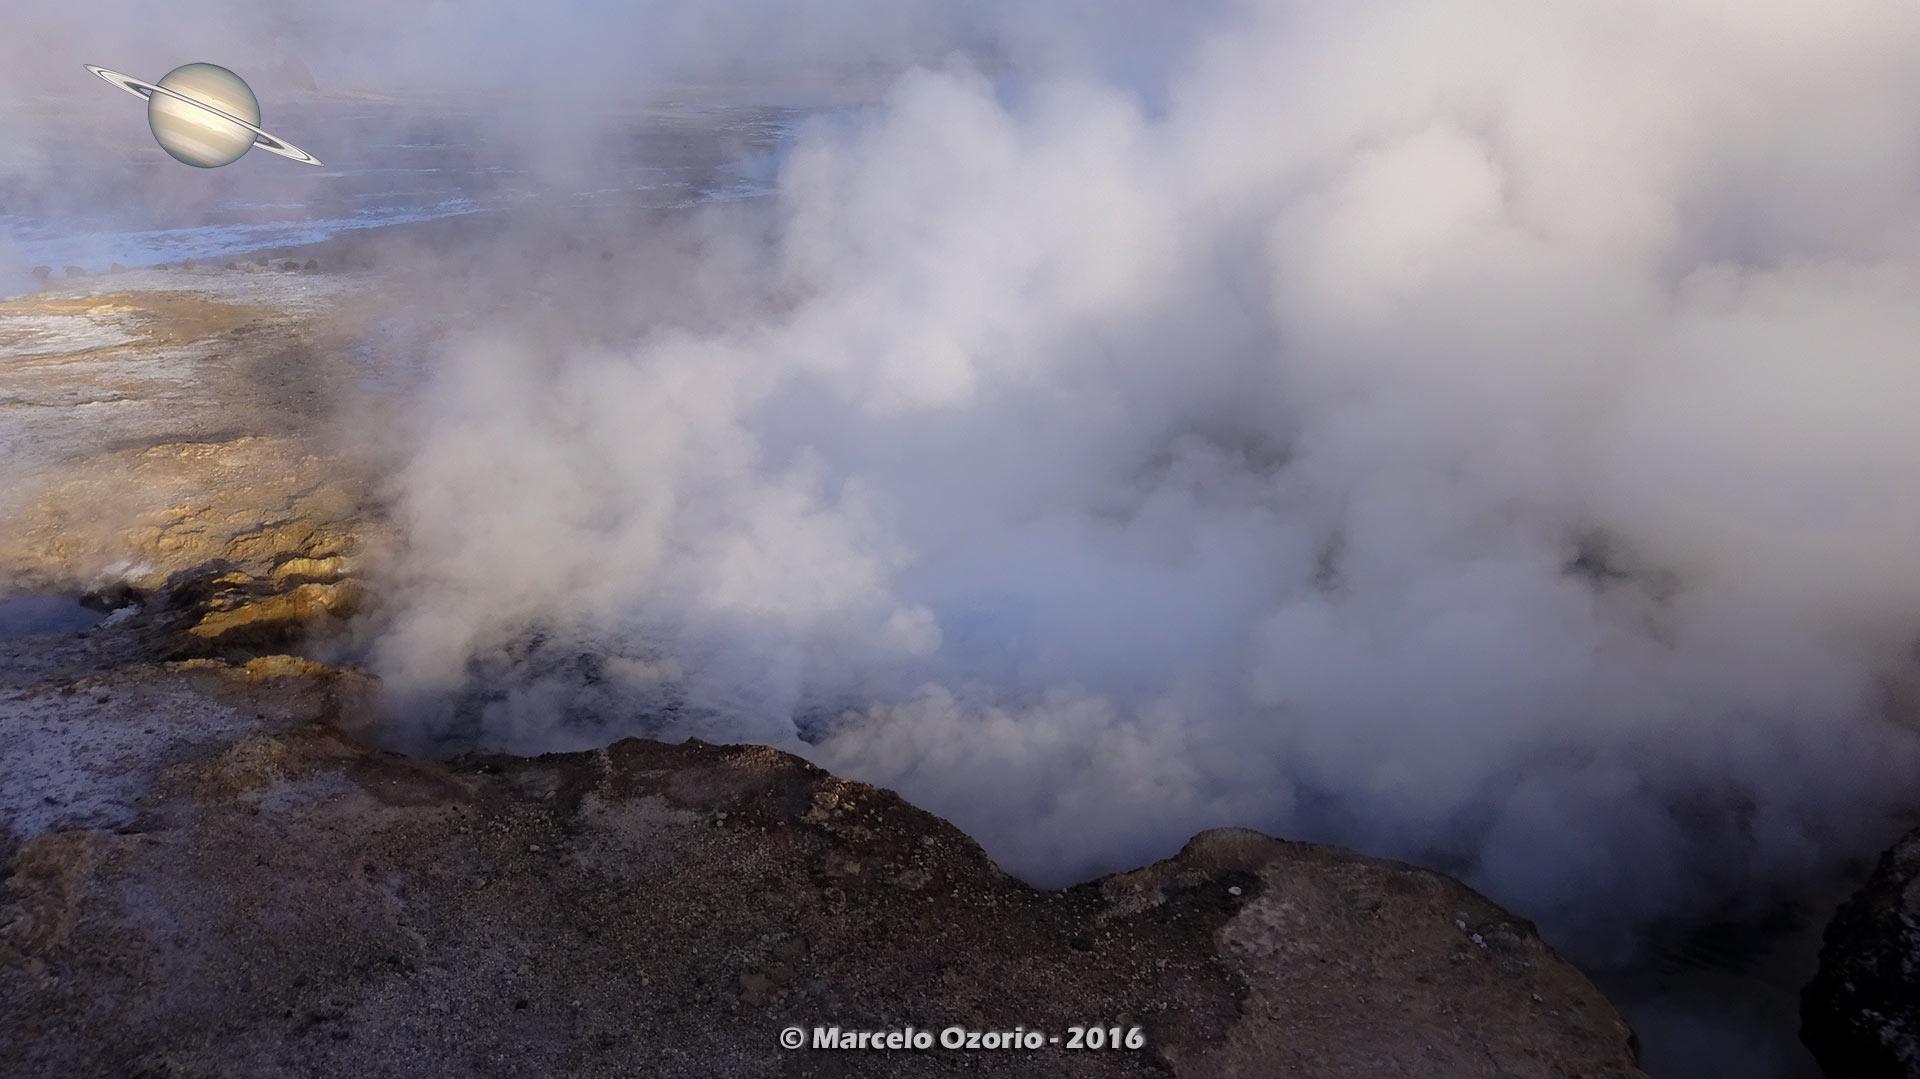 el tatio geysers atacama desert 16 - Os Surreais Gêiseres El Tatio - Deserto do Atacama - Chile